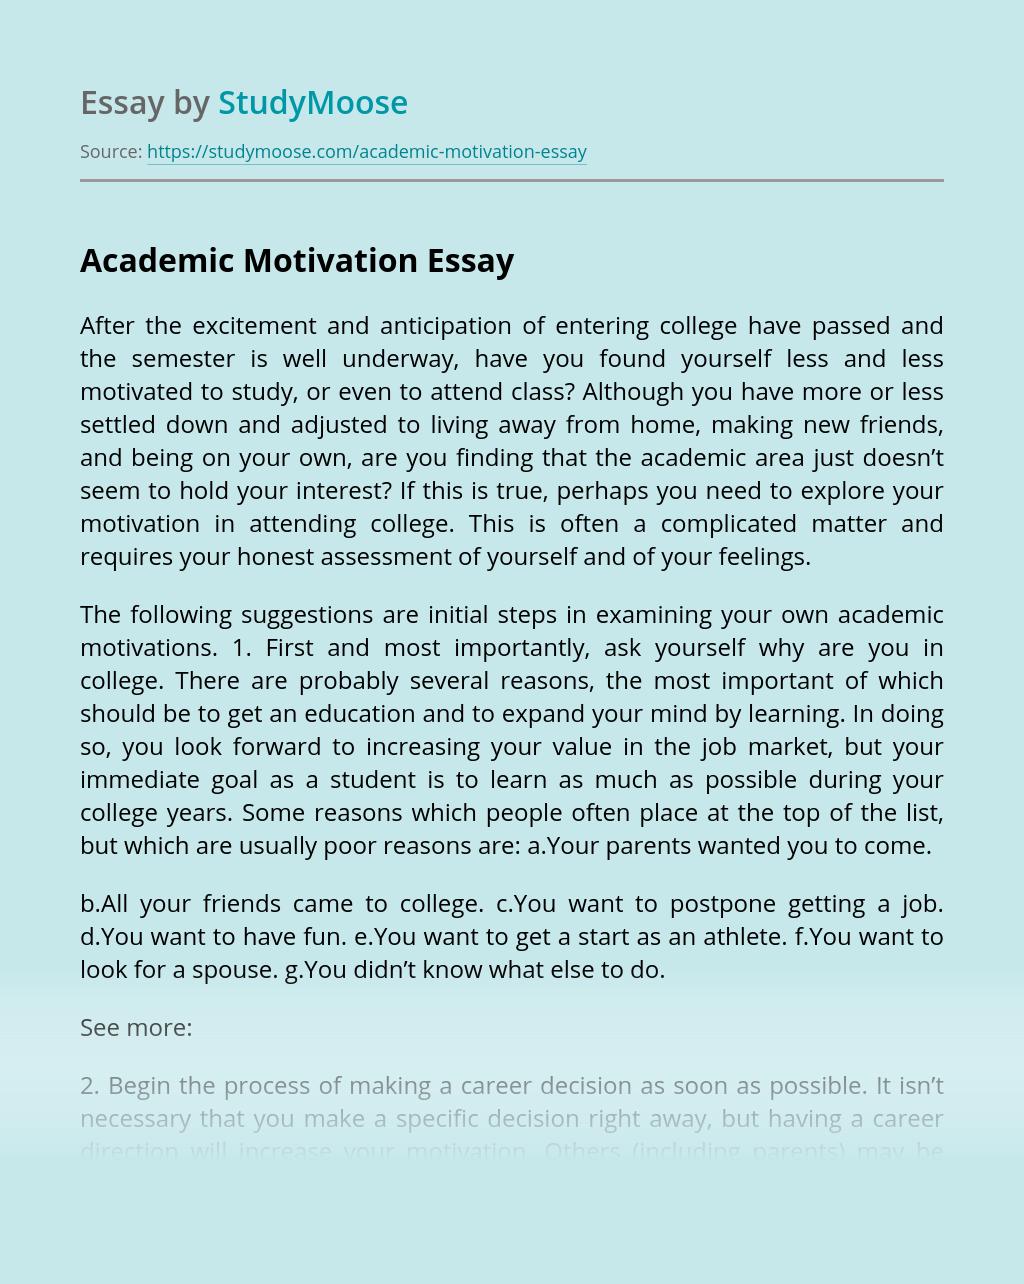 Academic Motivation